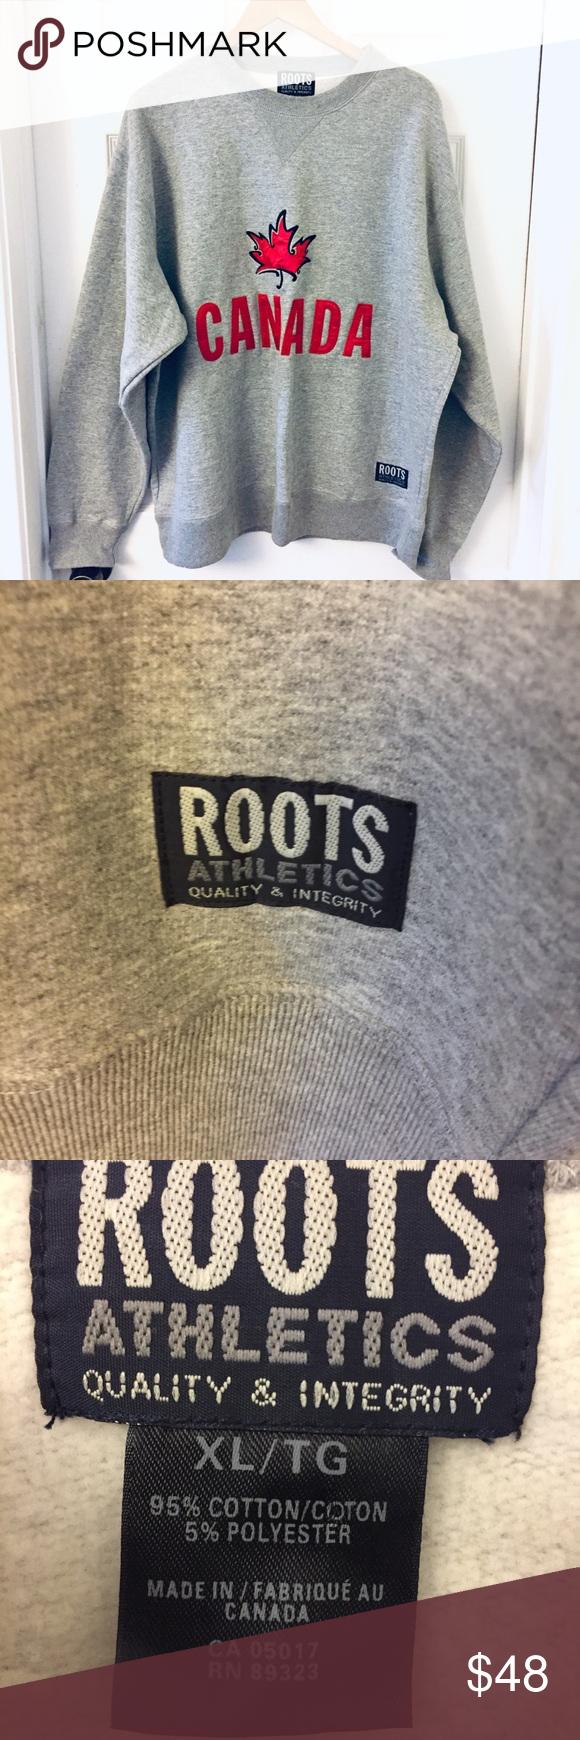 Roots Like New Sweatshirt Canada Maple Leaf Brand